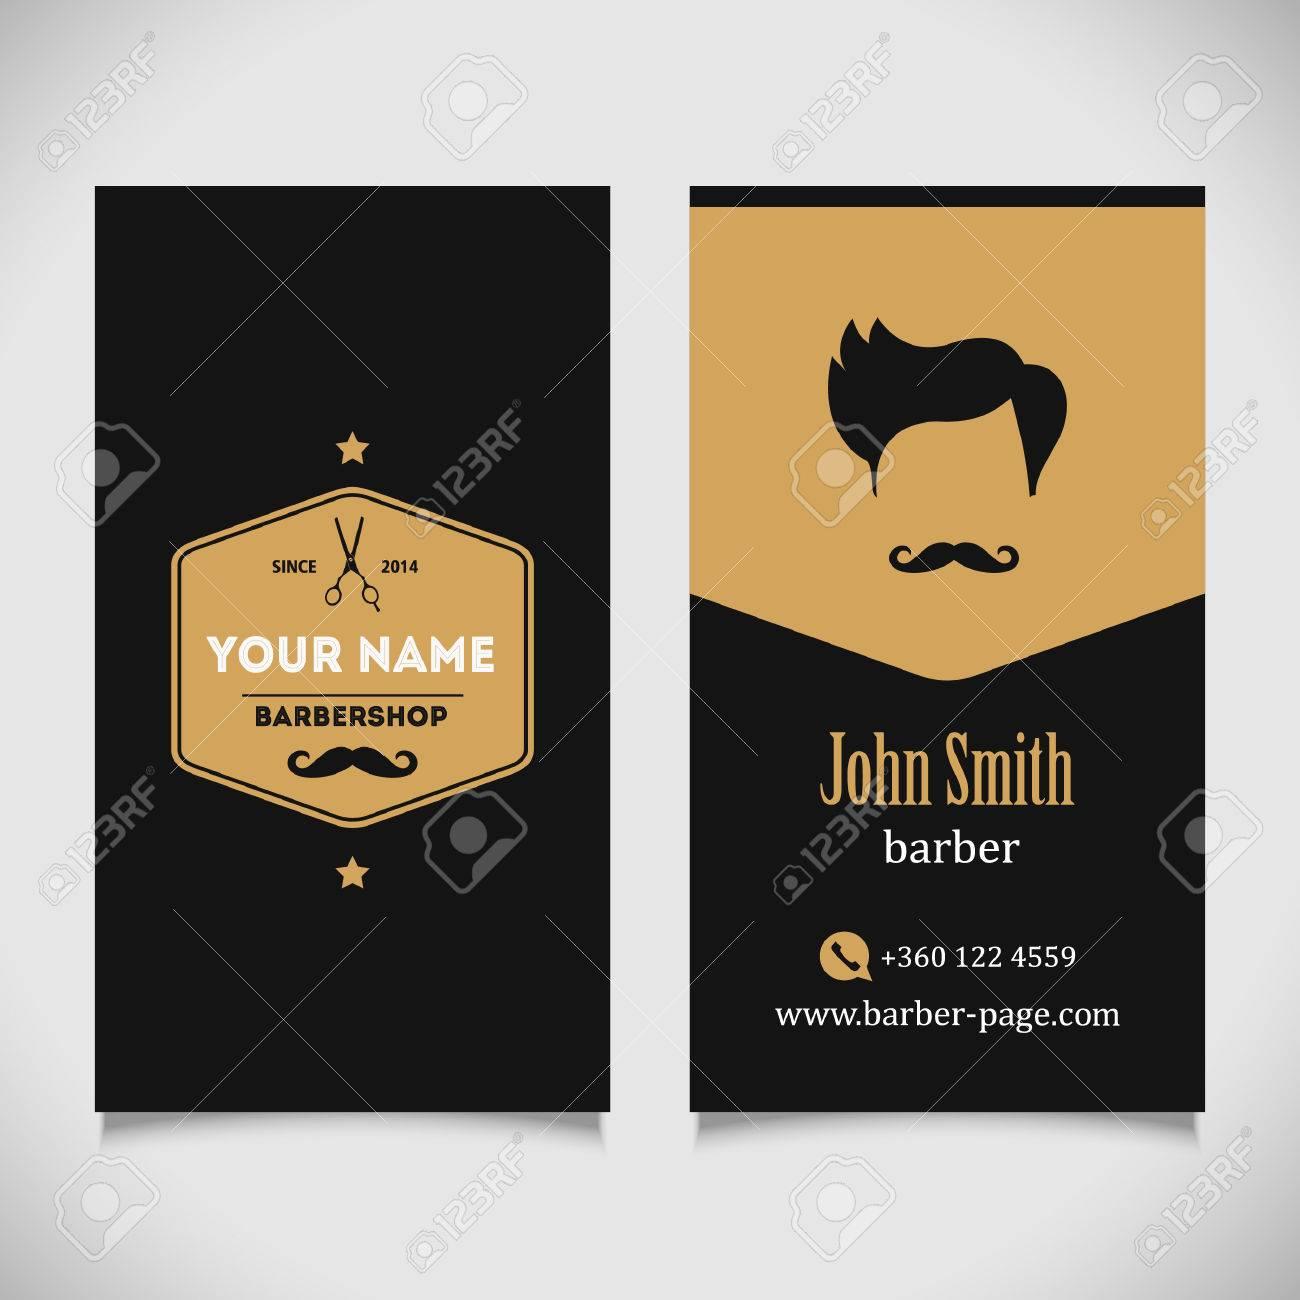 Hair salon barber shop business card design template royalty free hair salon barber shop business card design template stock vector 41643674 accmission Choice Image